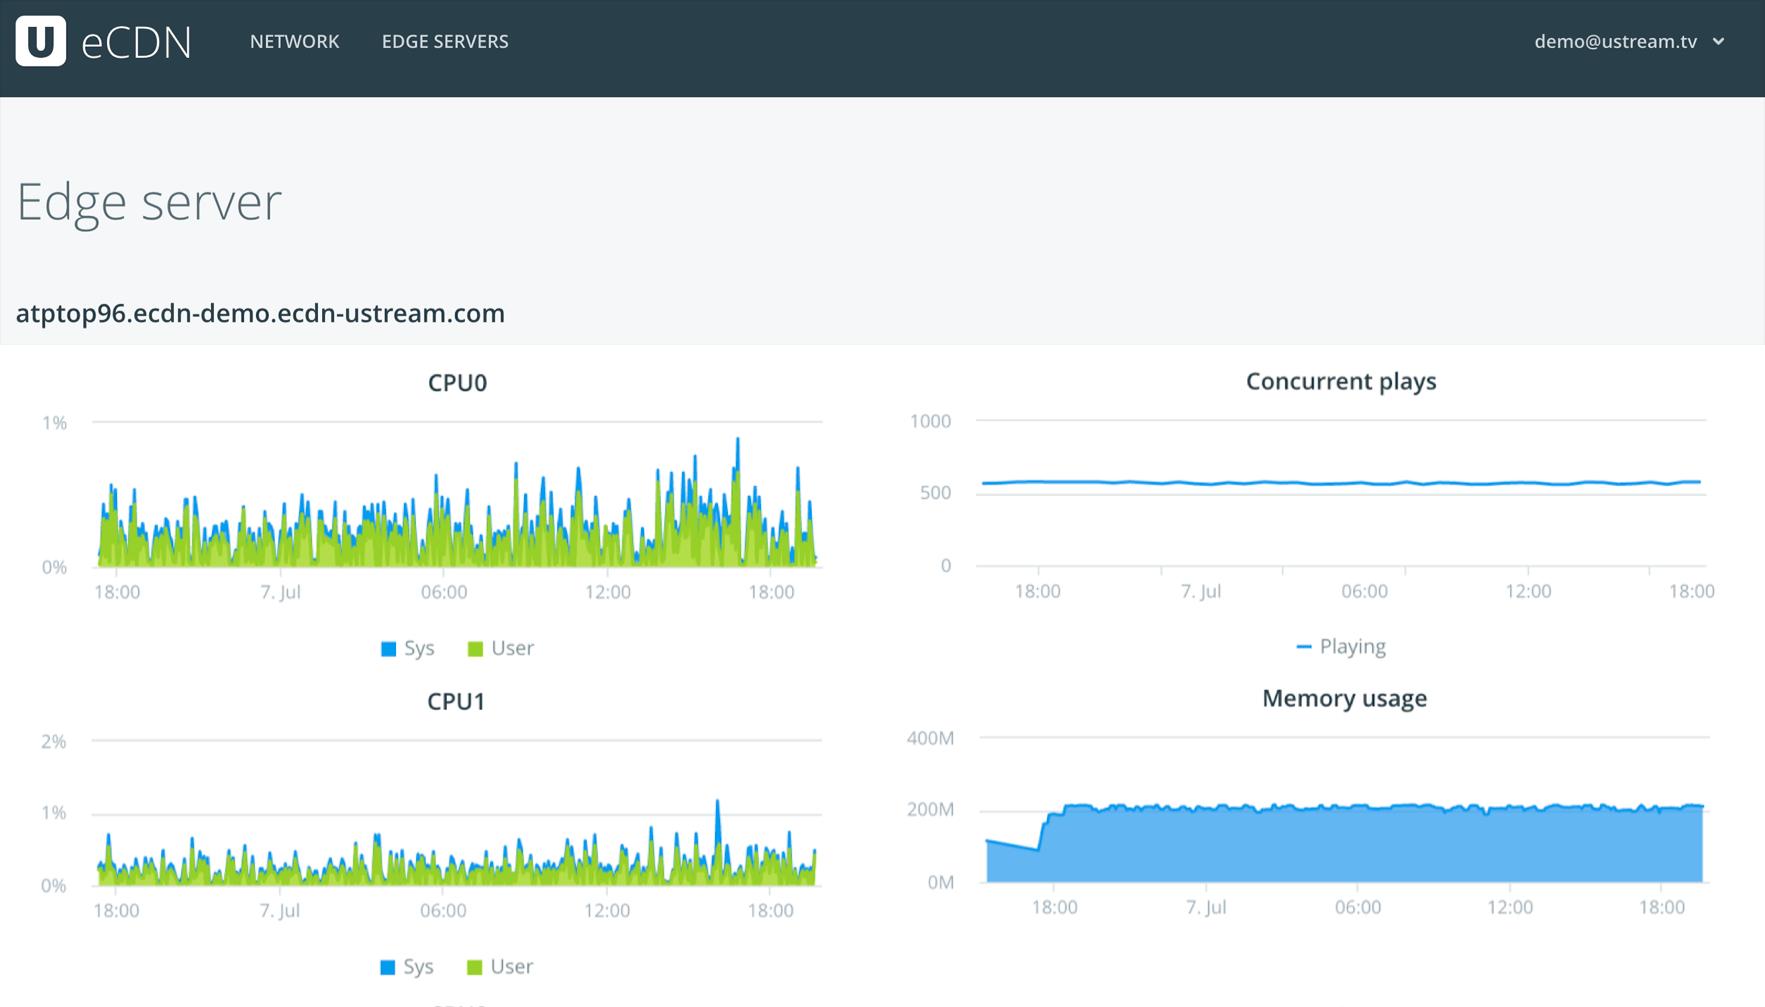 eCDN Benefits: Edge Server